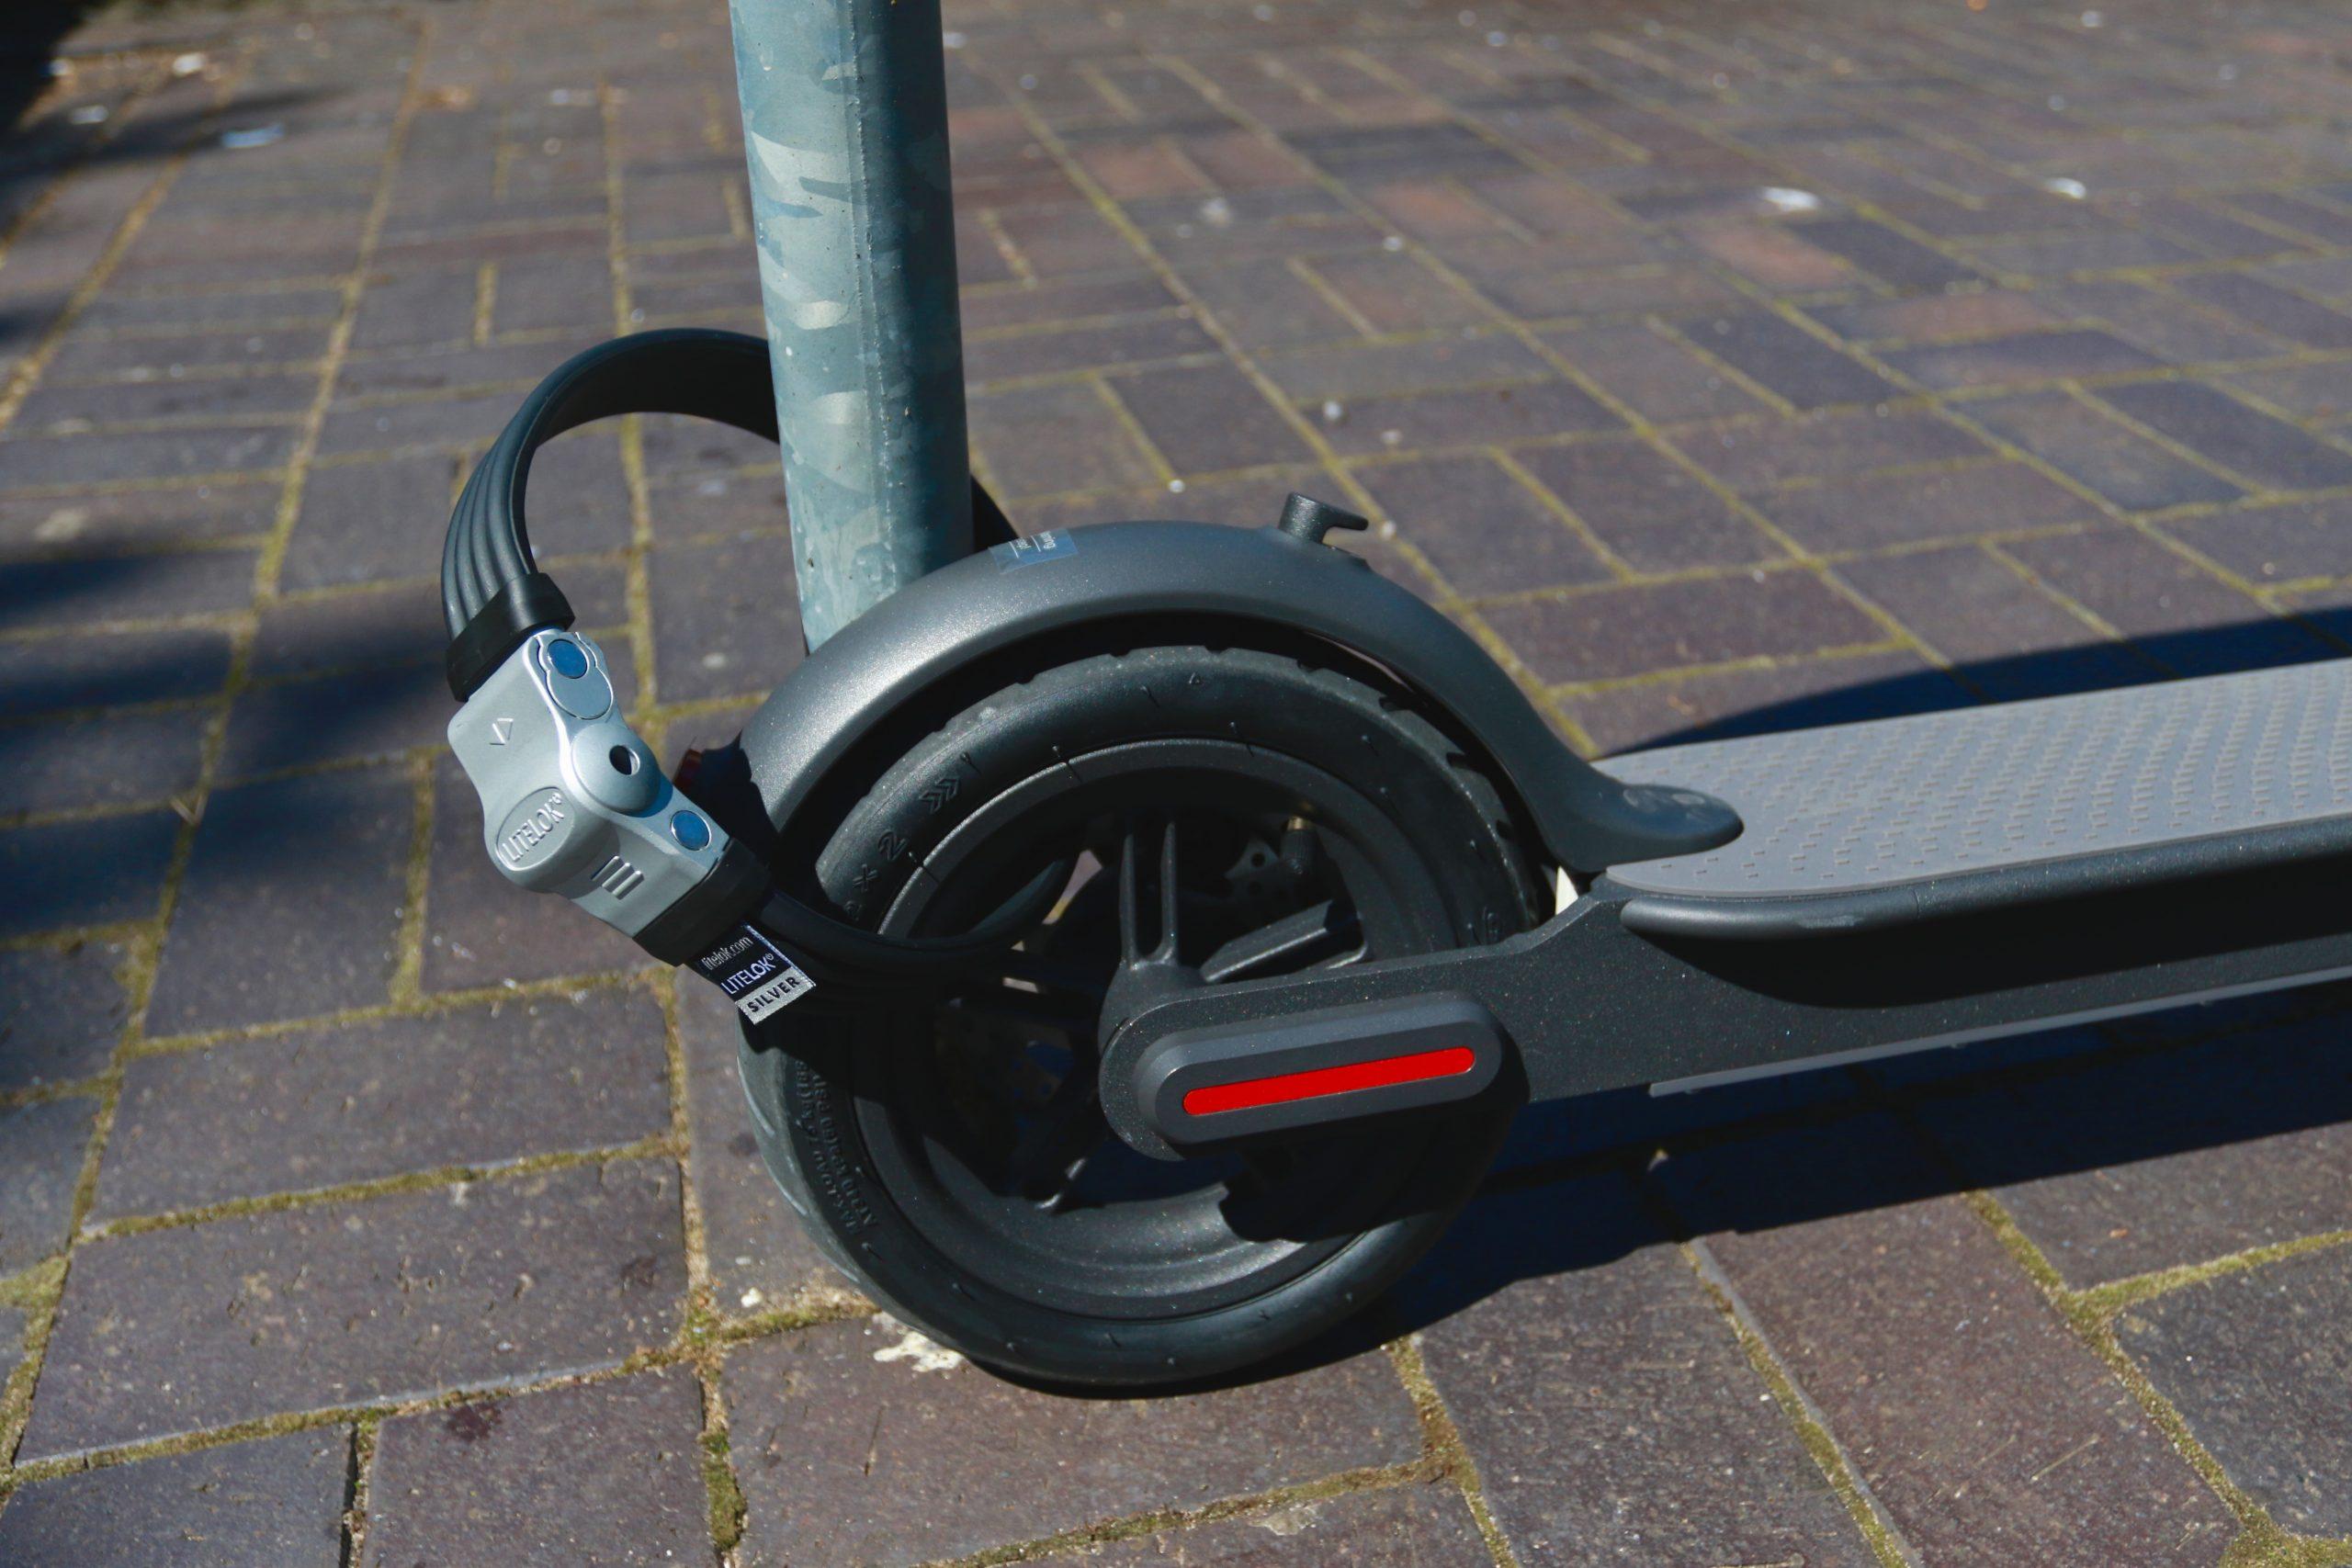 scooter litelok 1